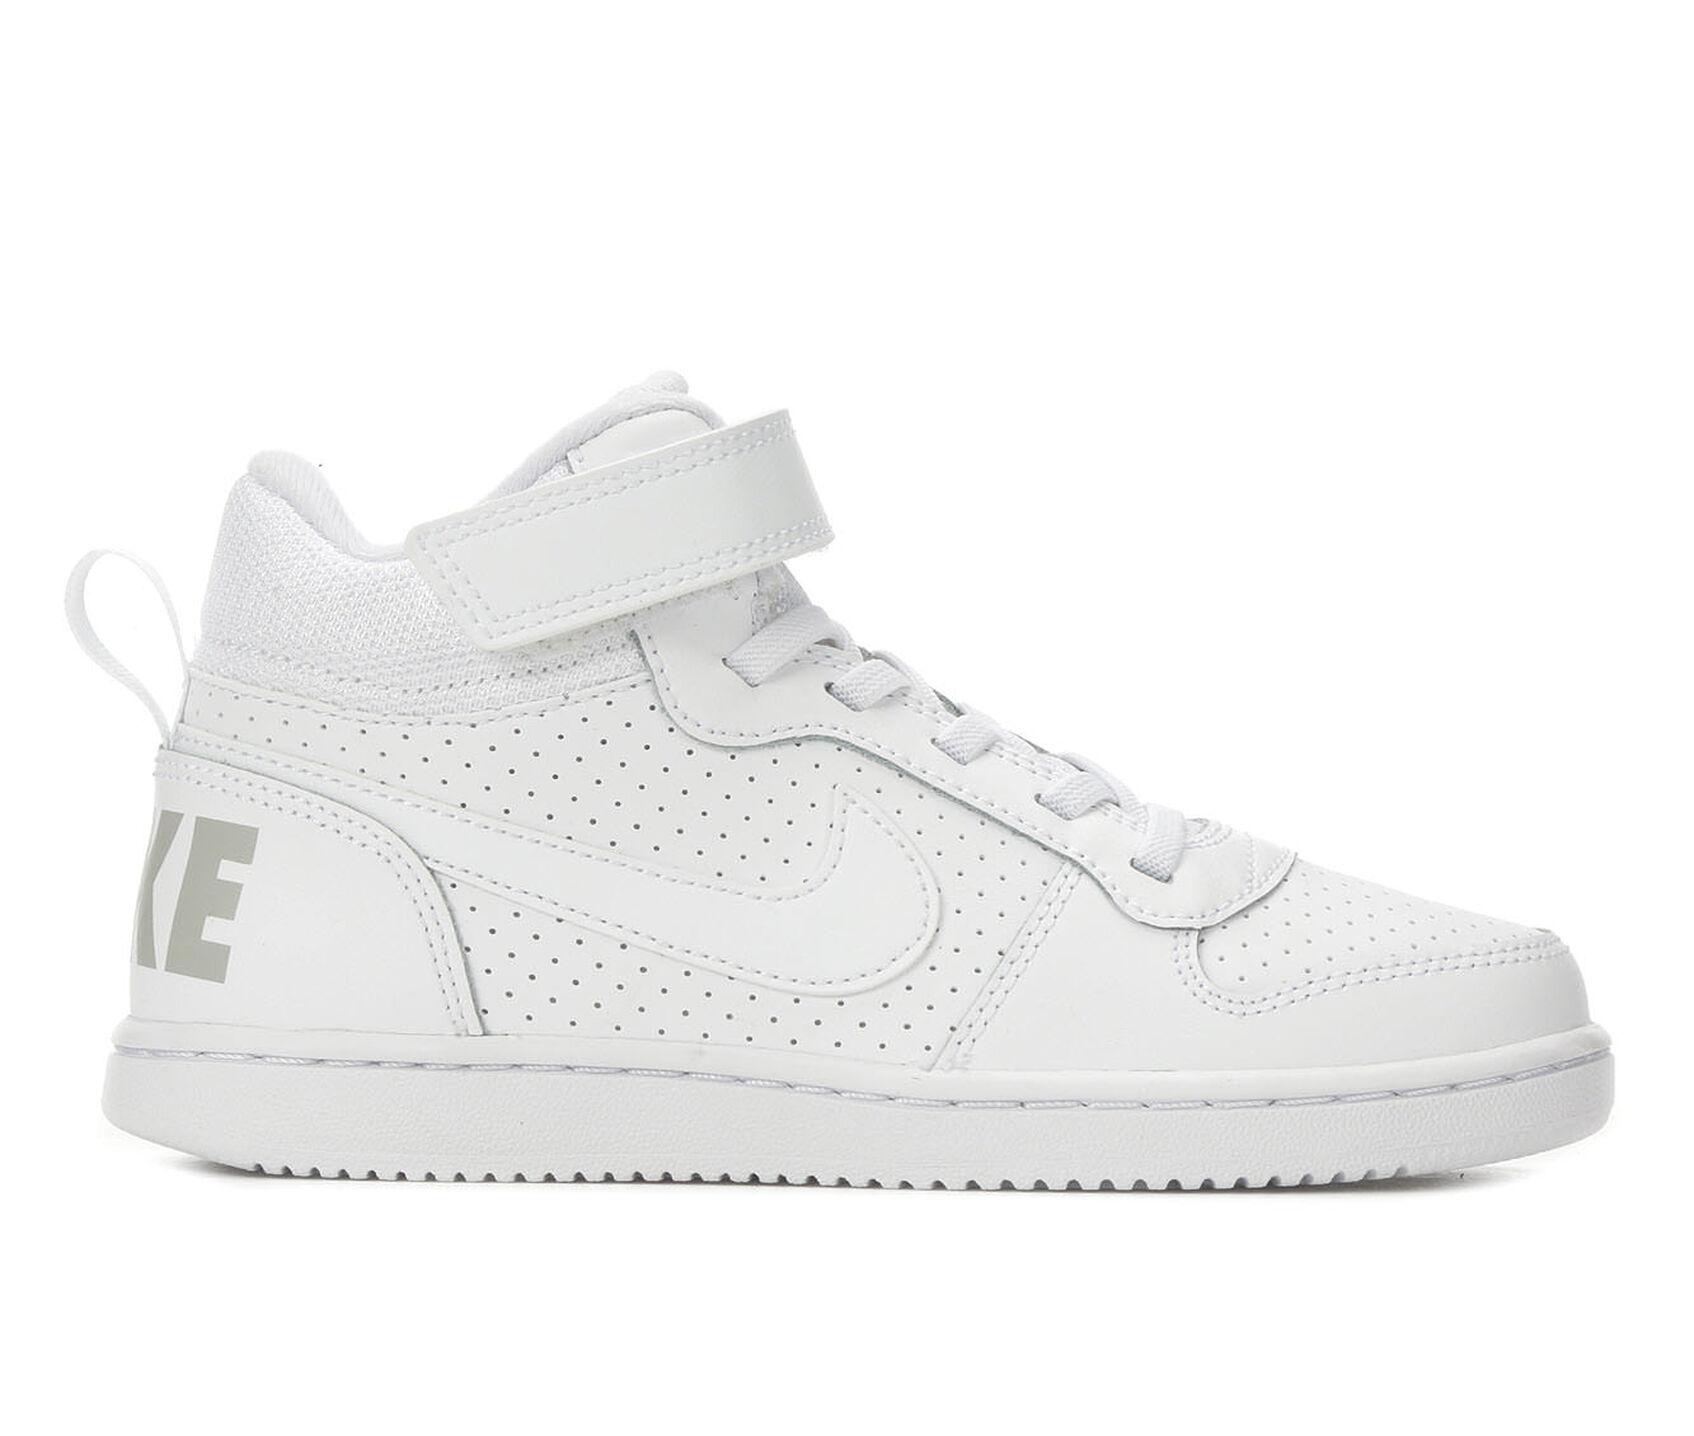 super popular 57c93 dd9dd ... Nike Little Kid Court Borough Mid Velcro High Top Basketball Shoes.  Previous